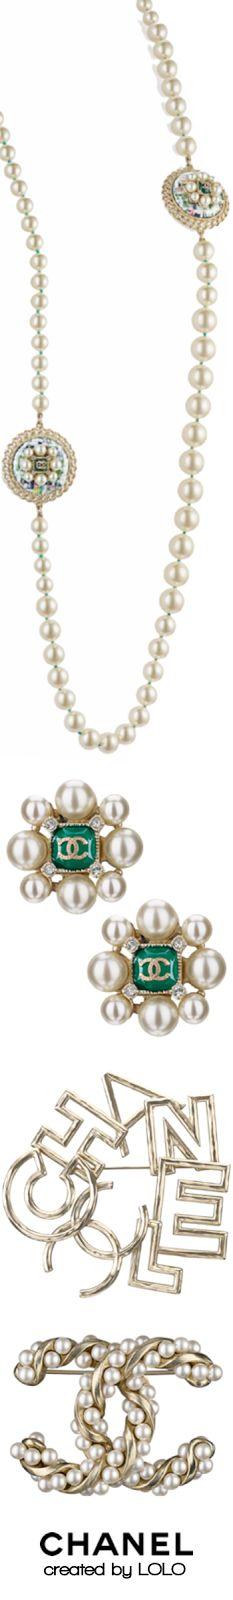 LOOKandLOVEwithLOLO: Chanel Spring-Summer 2015 Accessories